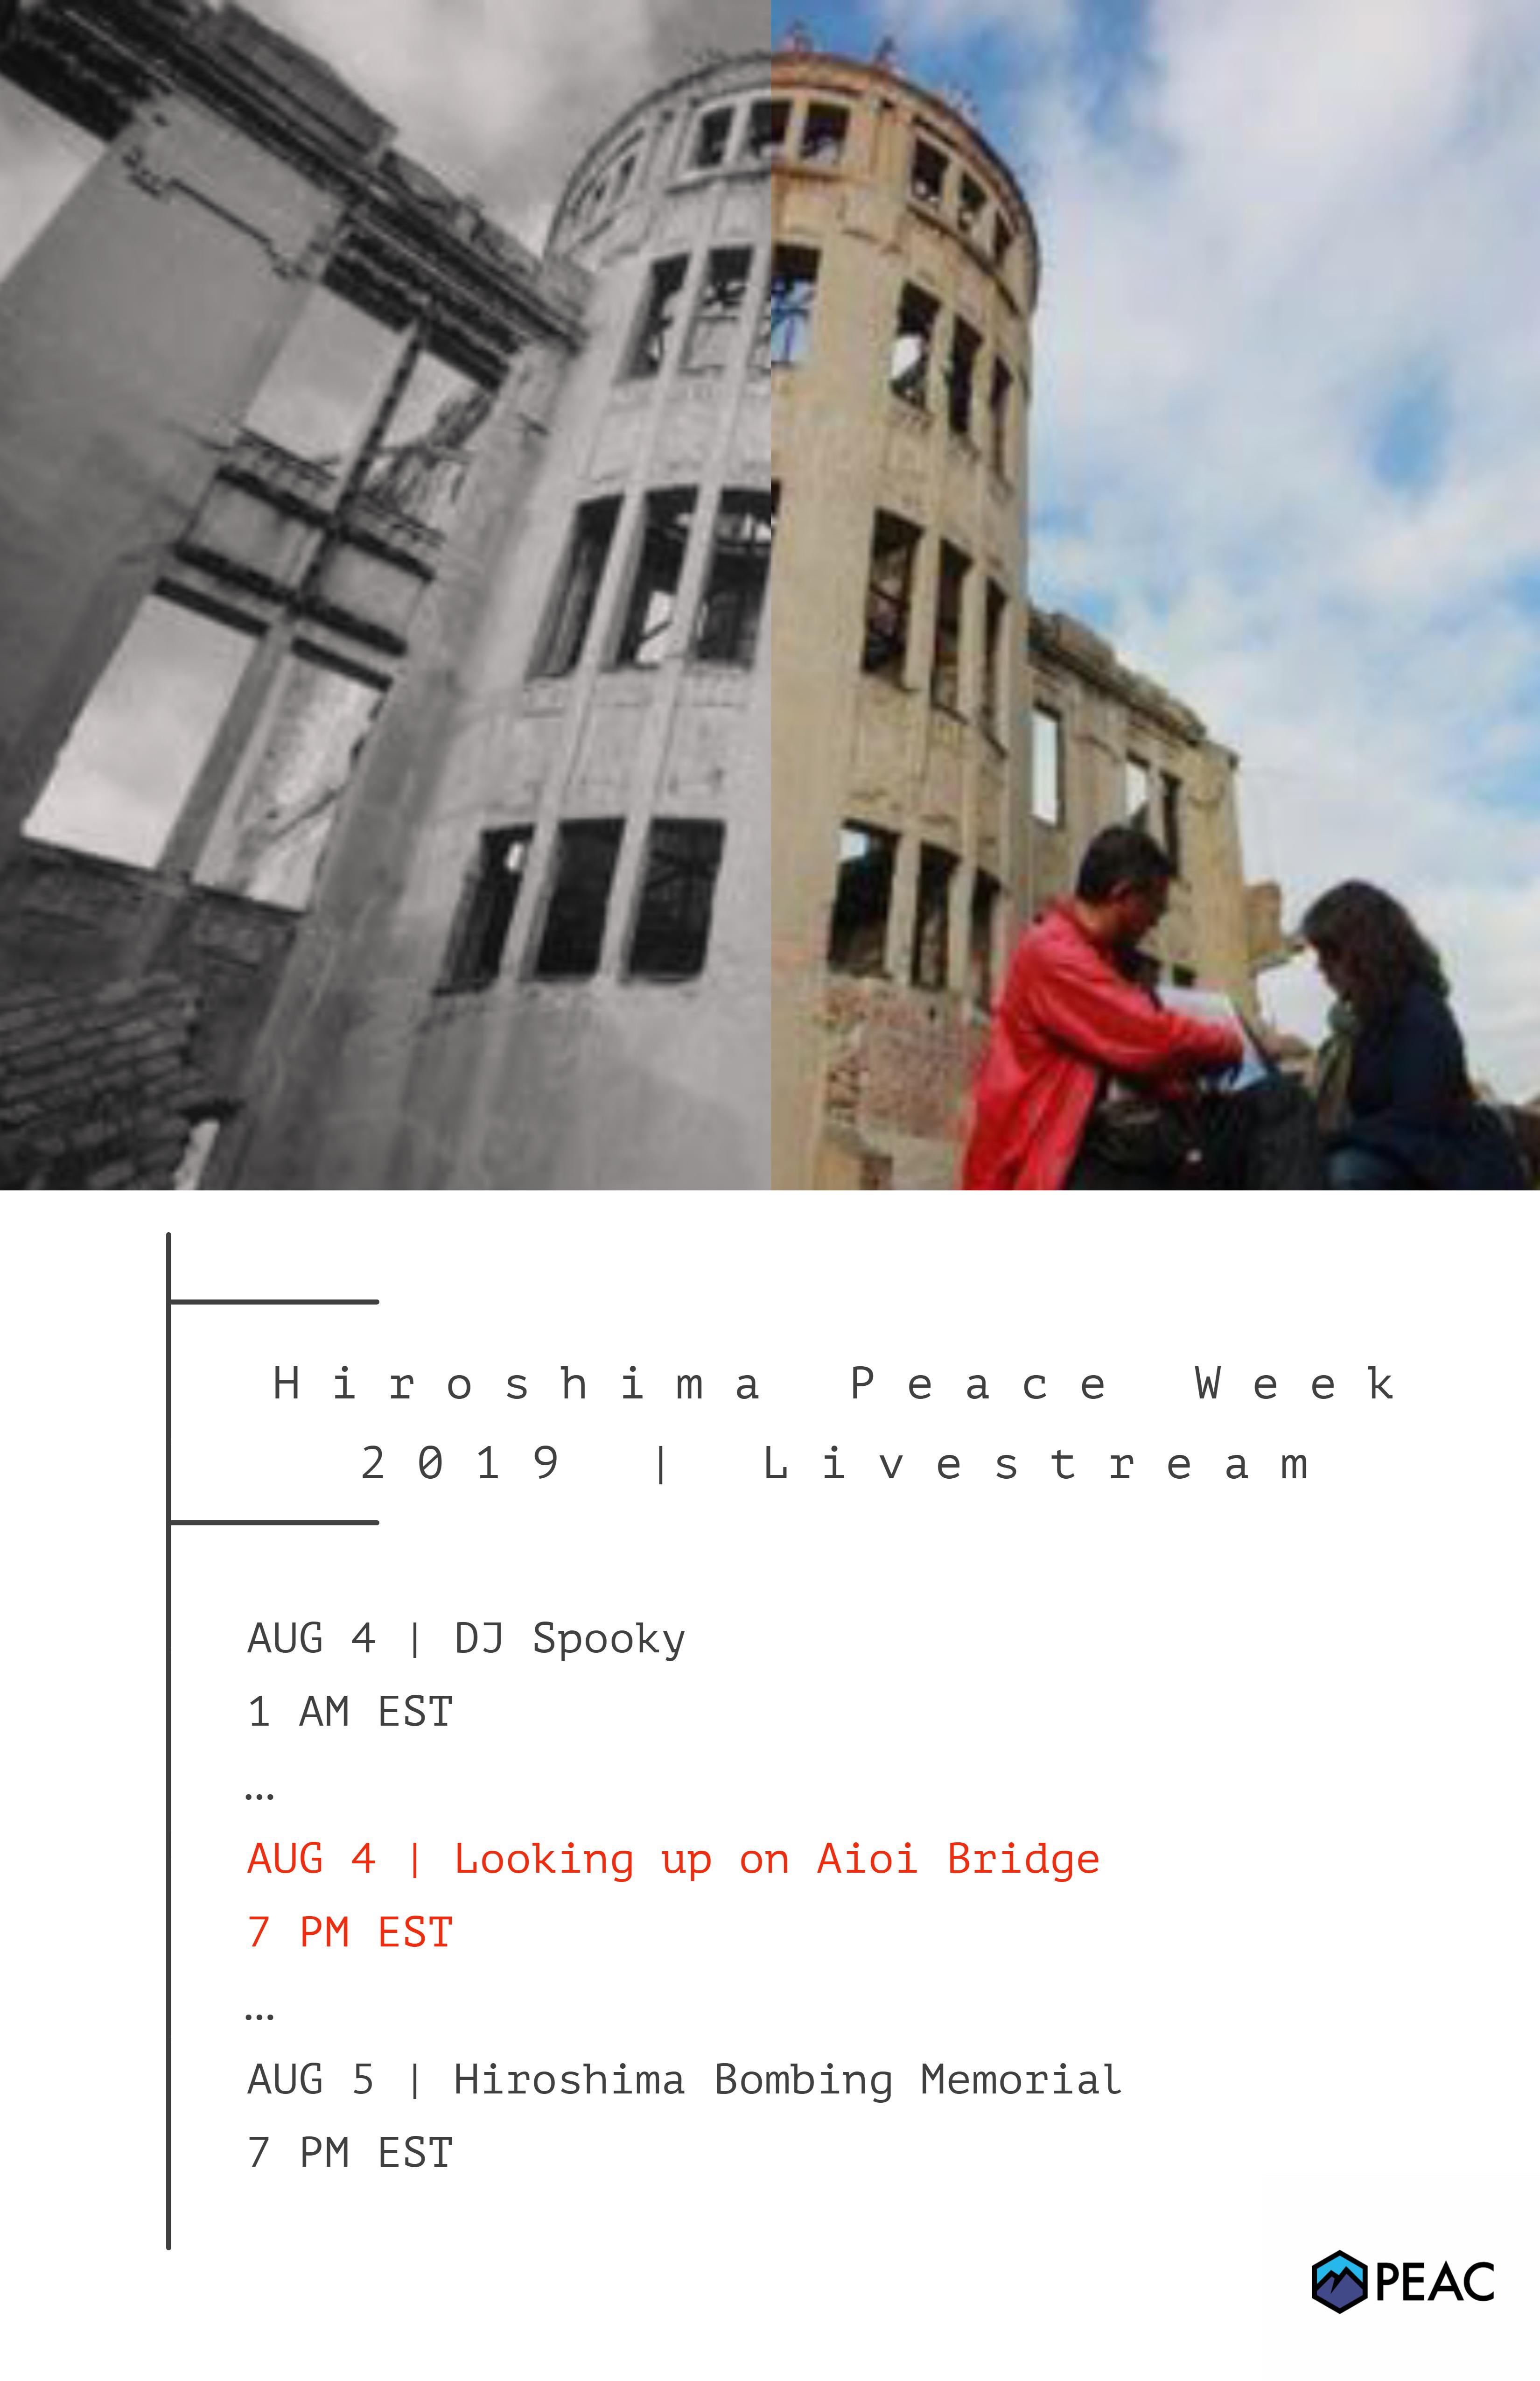 HiroshimaPeaceWeekk2019_(1).png